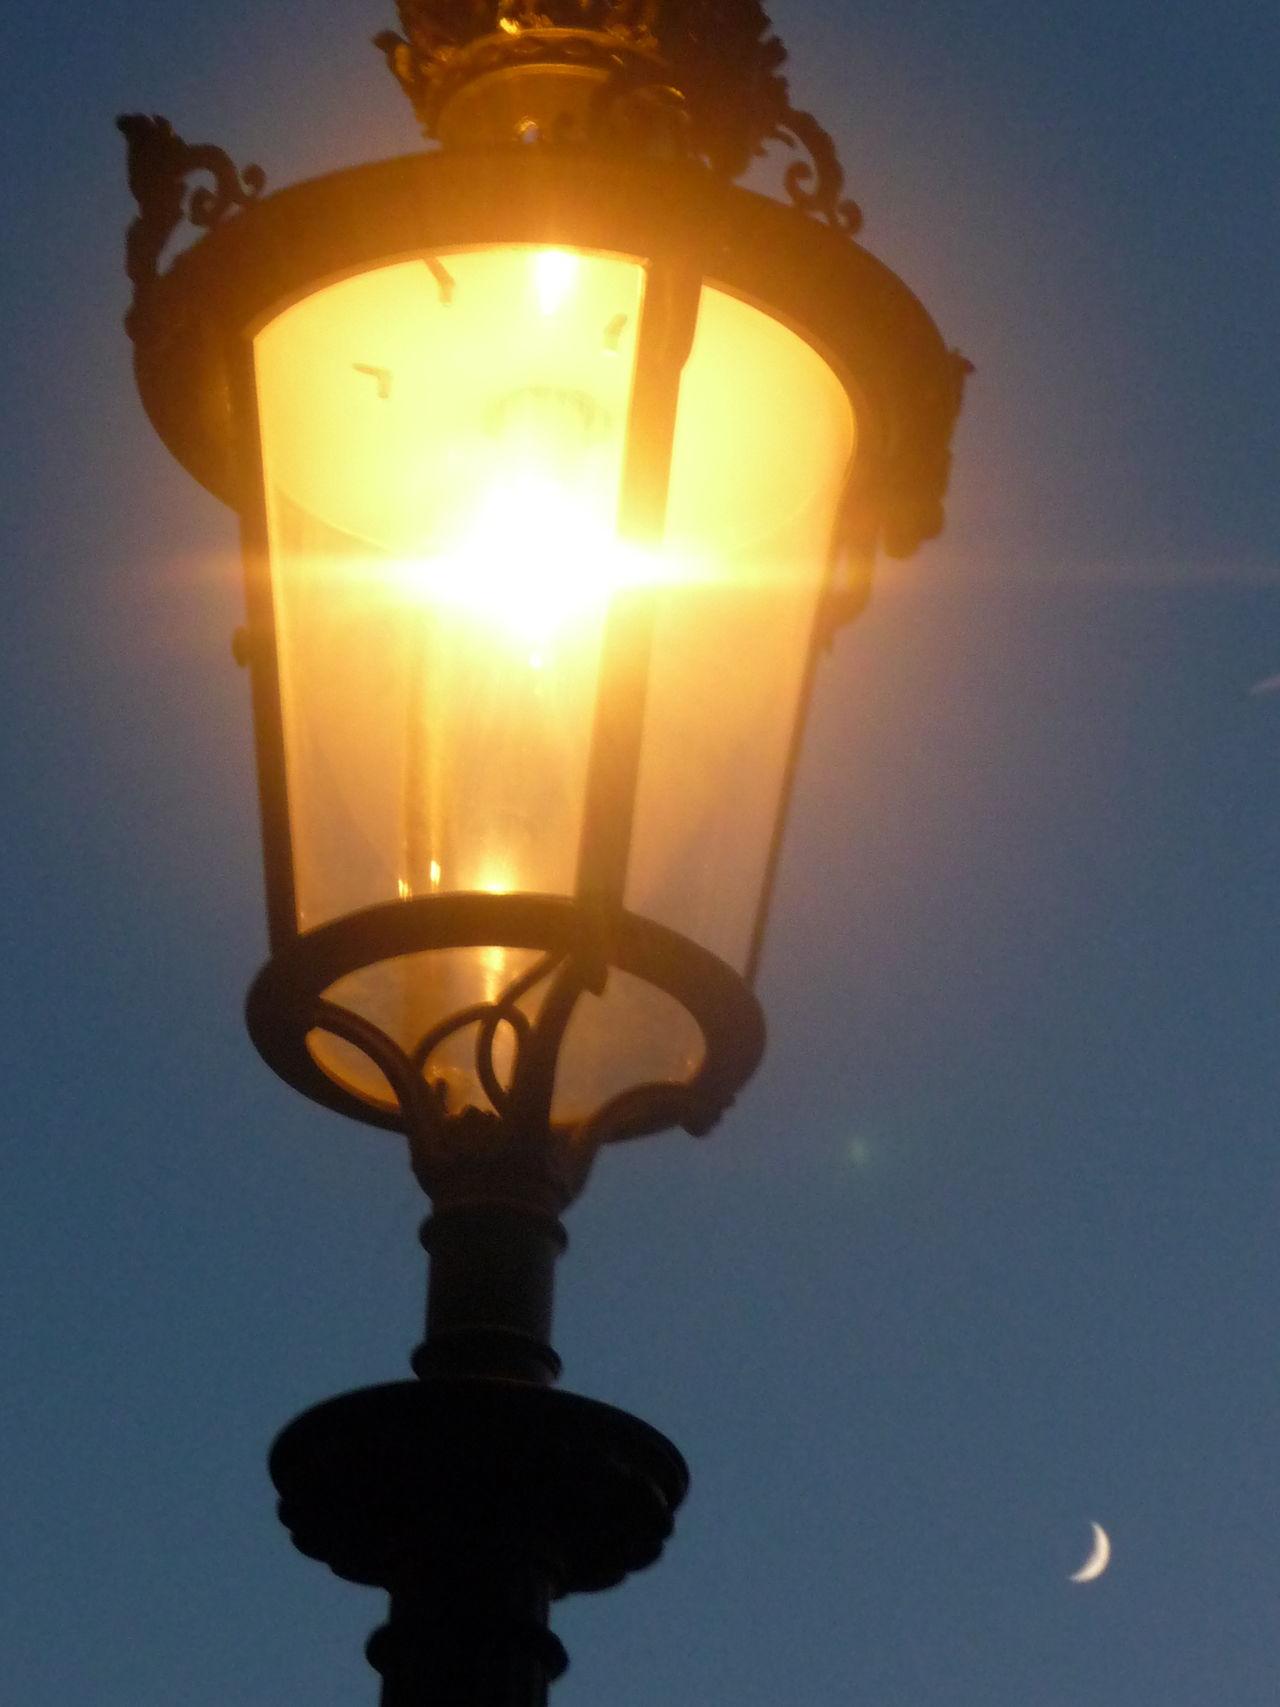 Ciel Himmel Lampadaire Light Bulb Lune Mond Moon Paris Sky Strassenlaterne